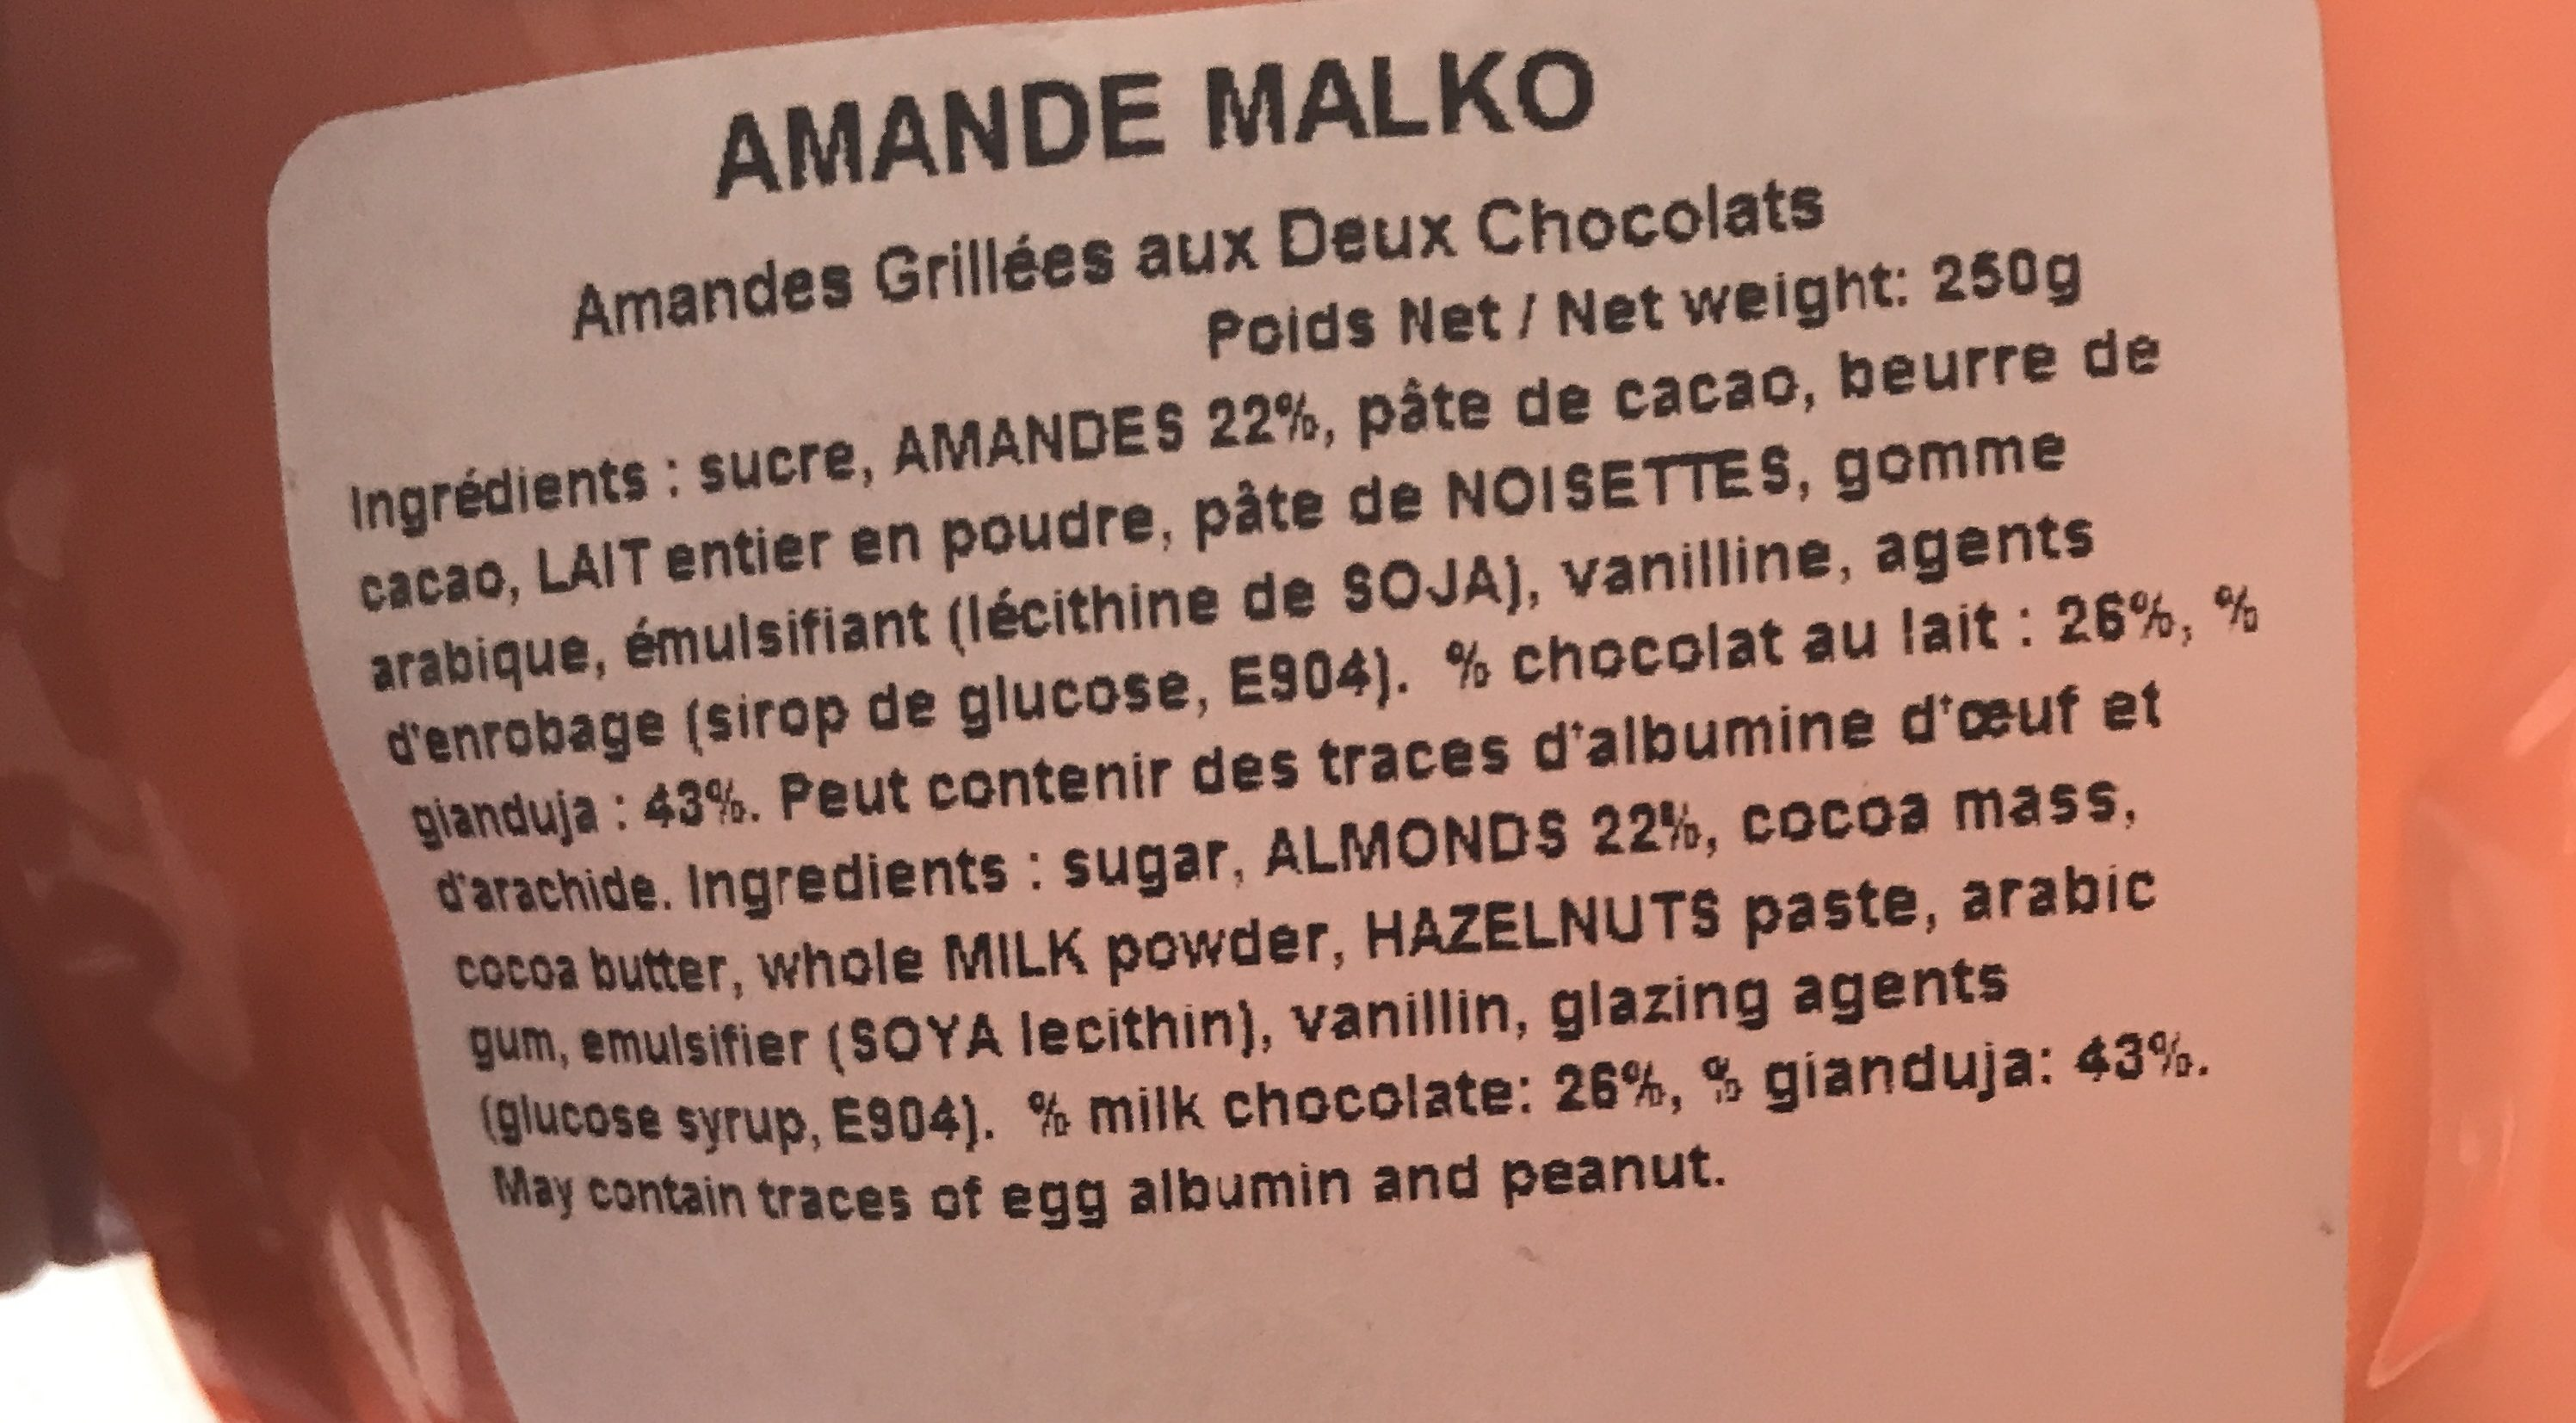 Amande malko - Ingredients - fr